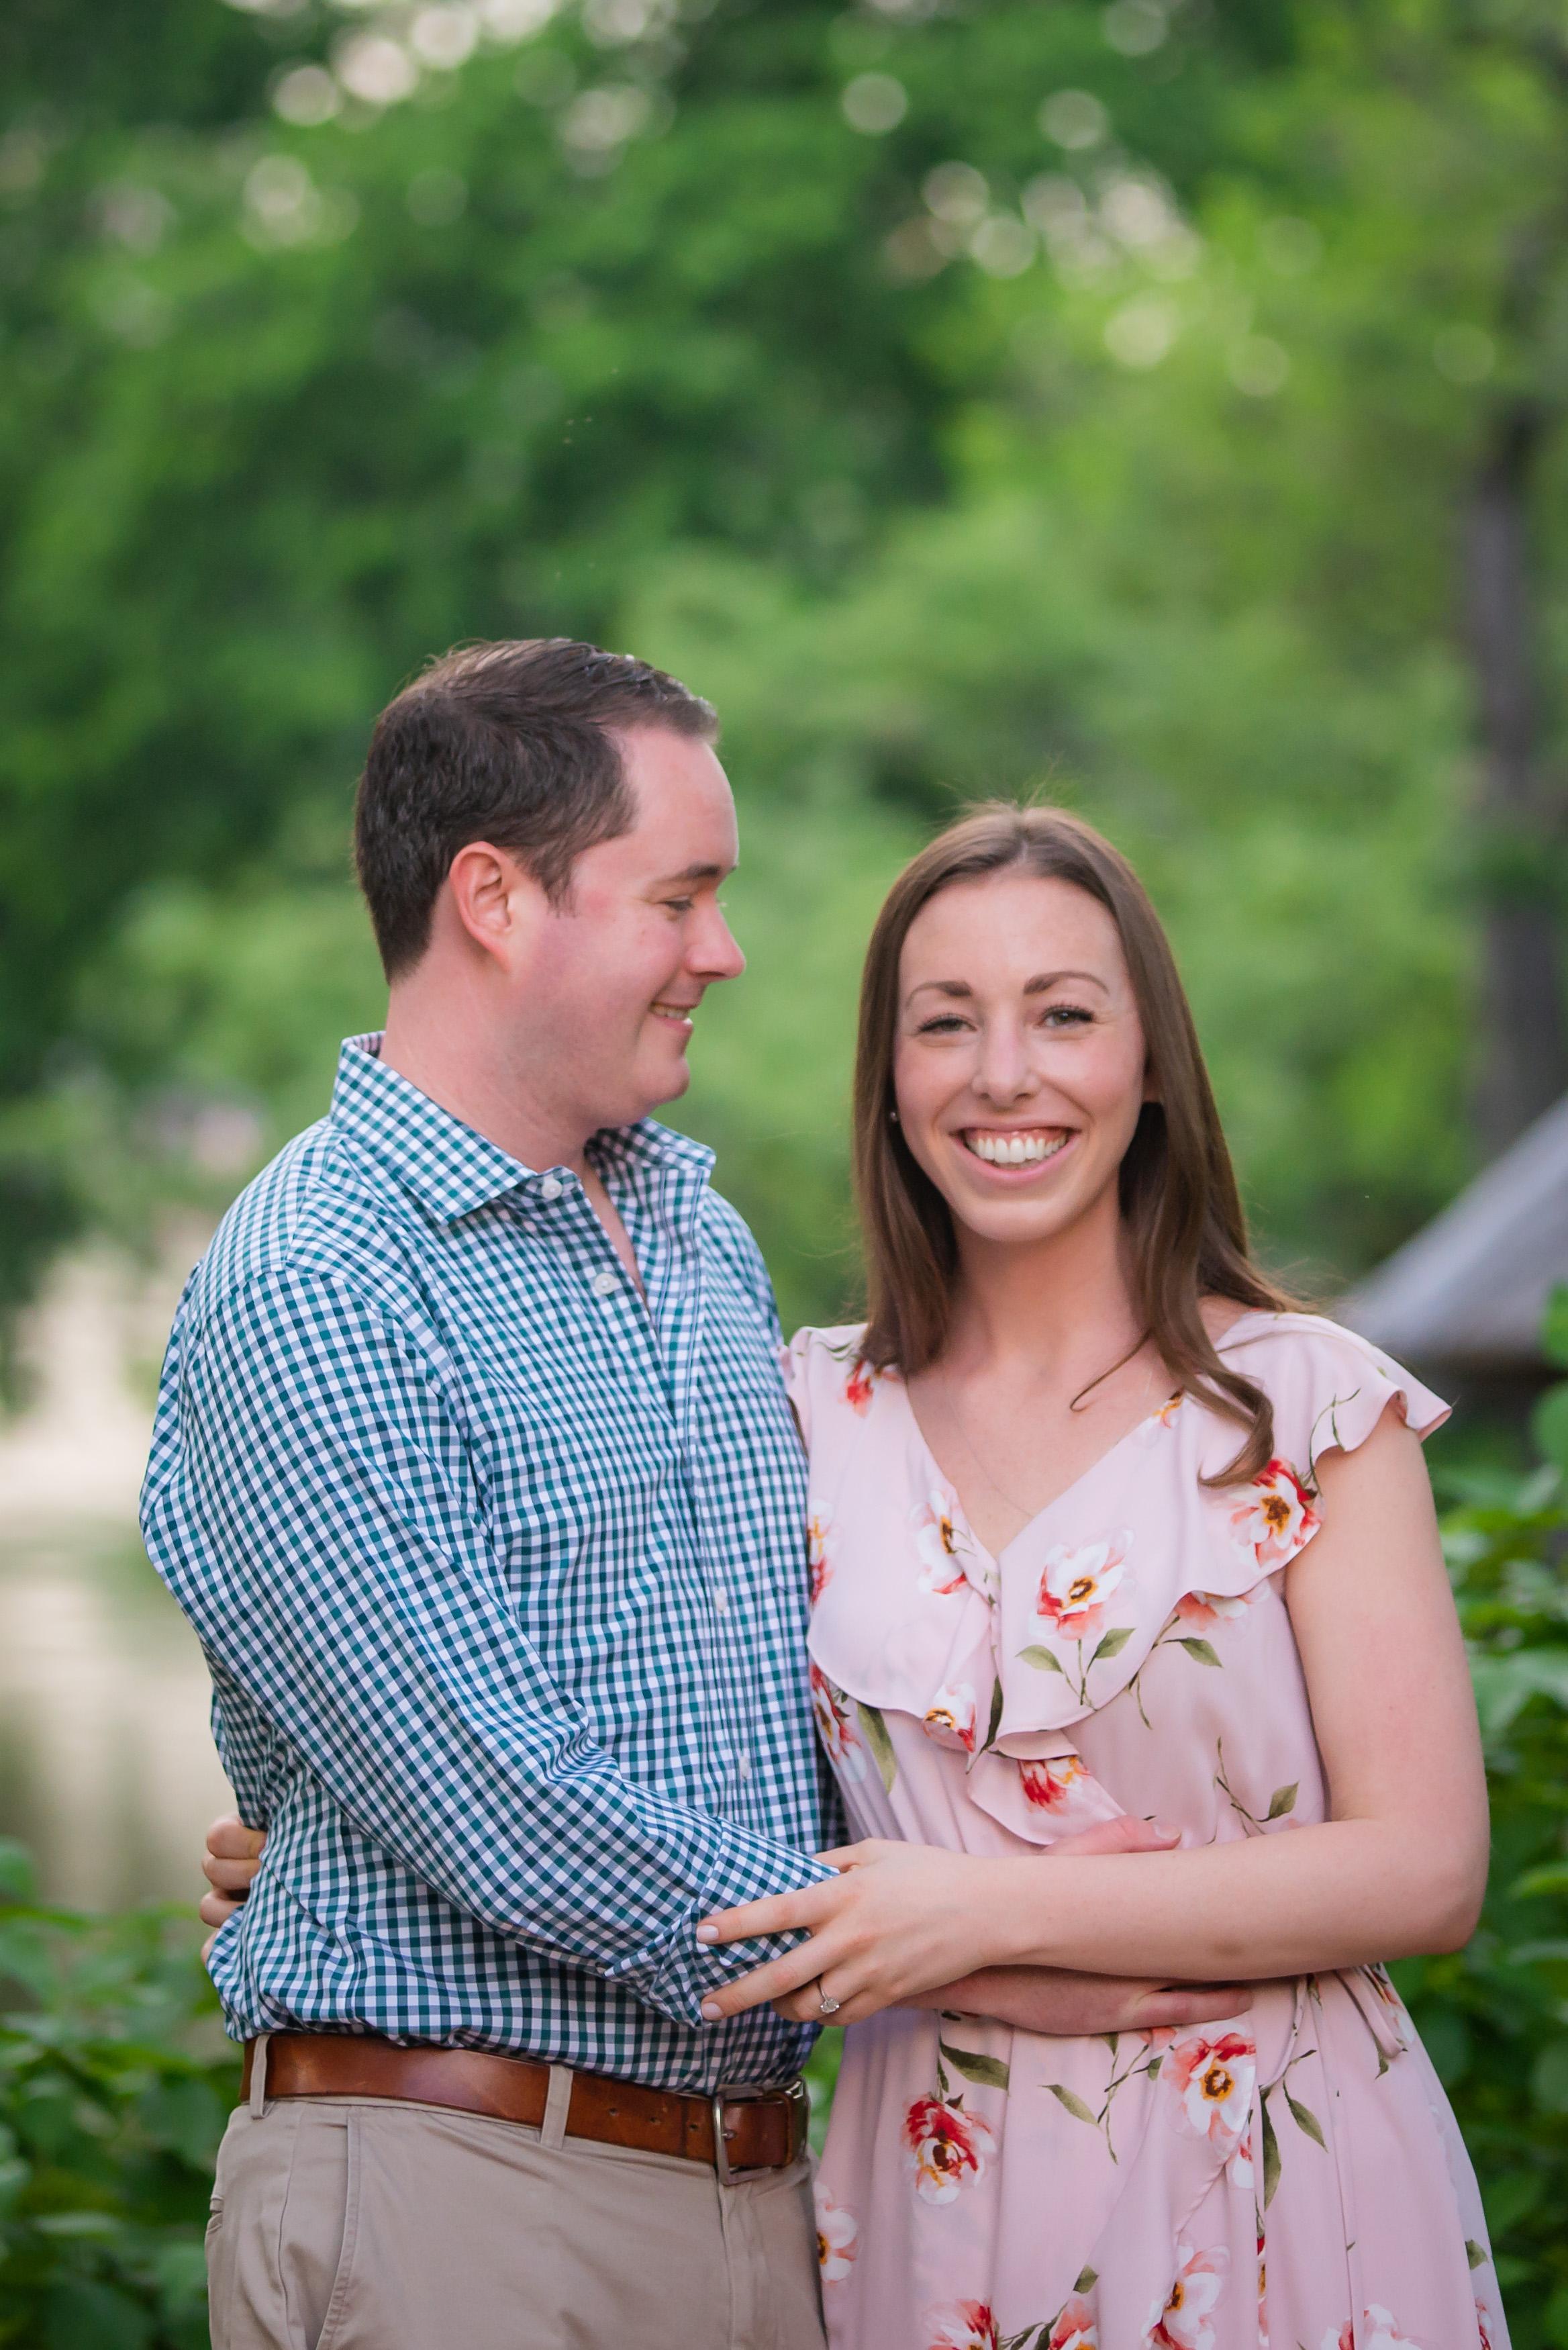 Carolina & Sean Engagement session by Unveiled-Weddings.com